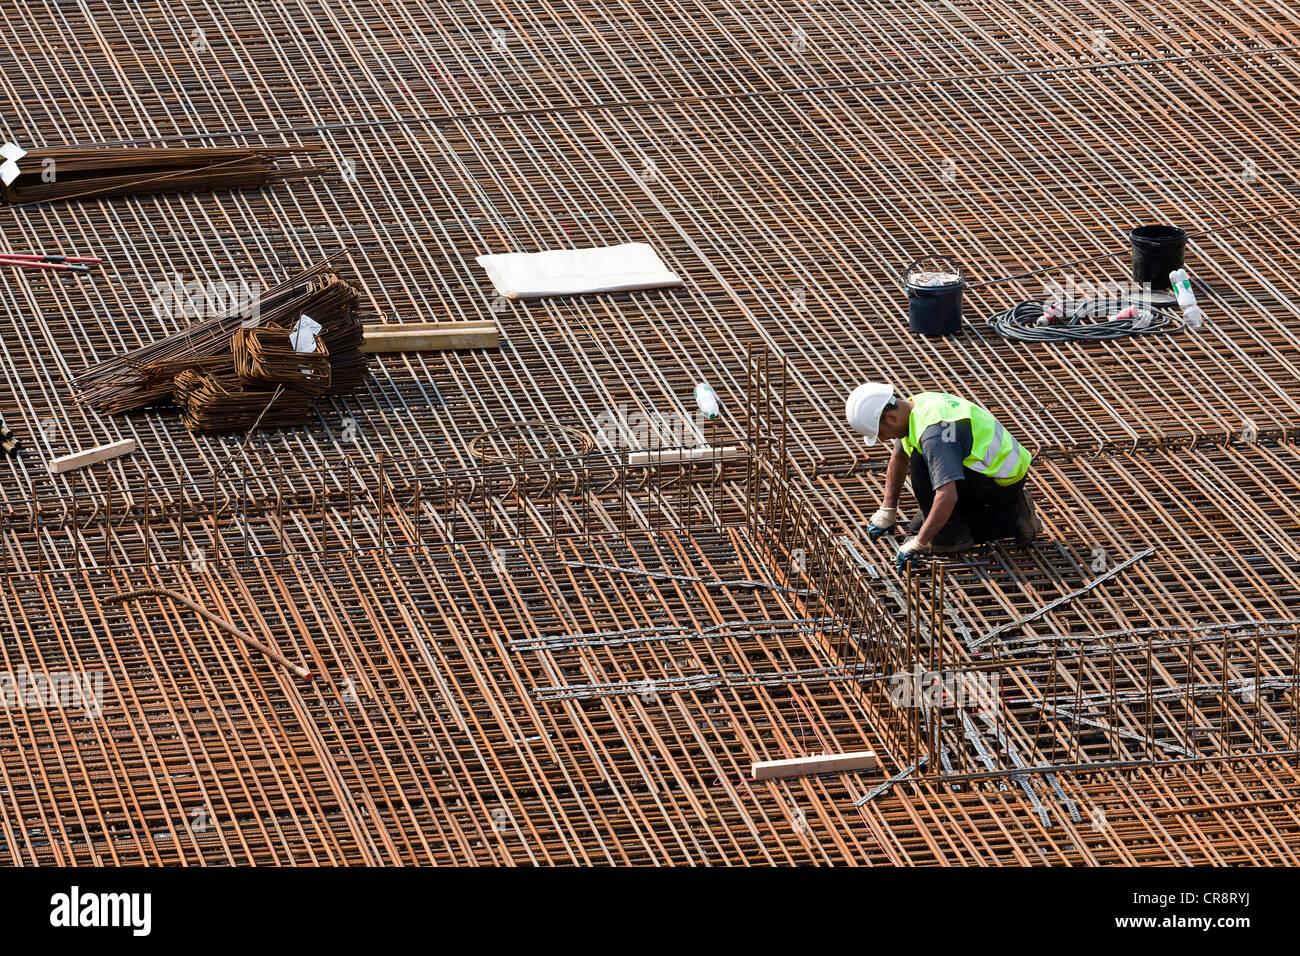 construction worker installing steel rebar beams for reinforced concrete building site rebar worker